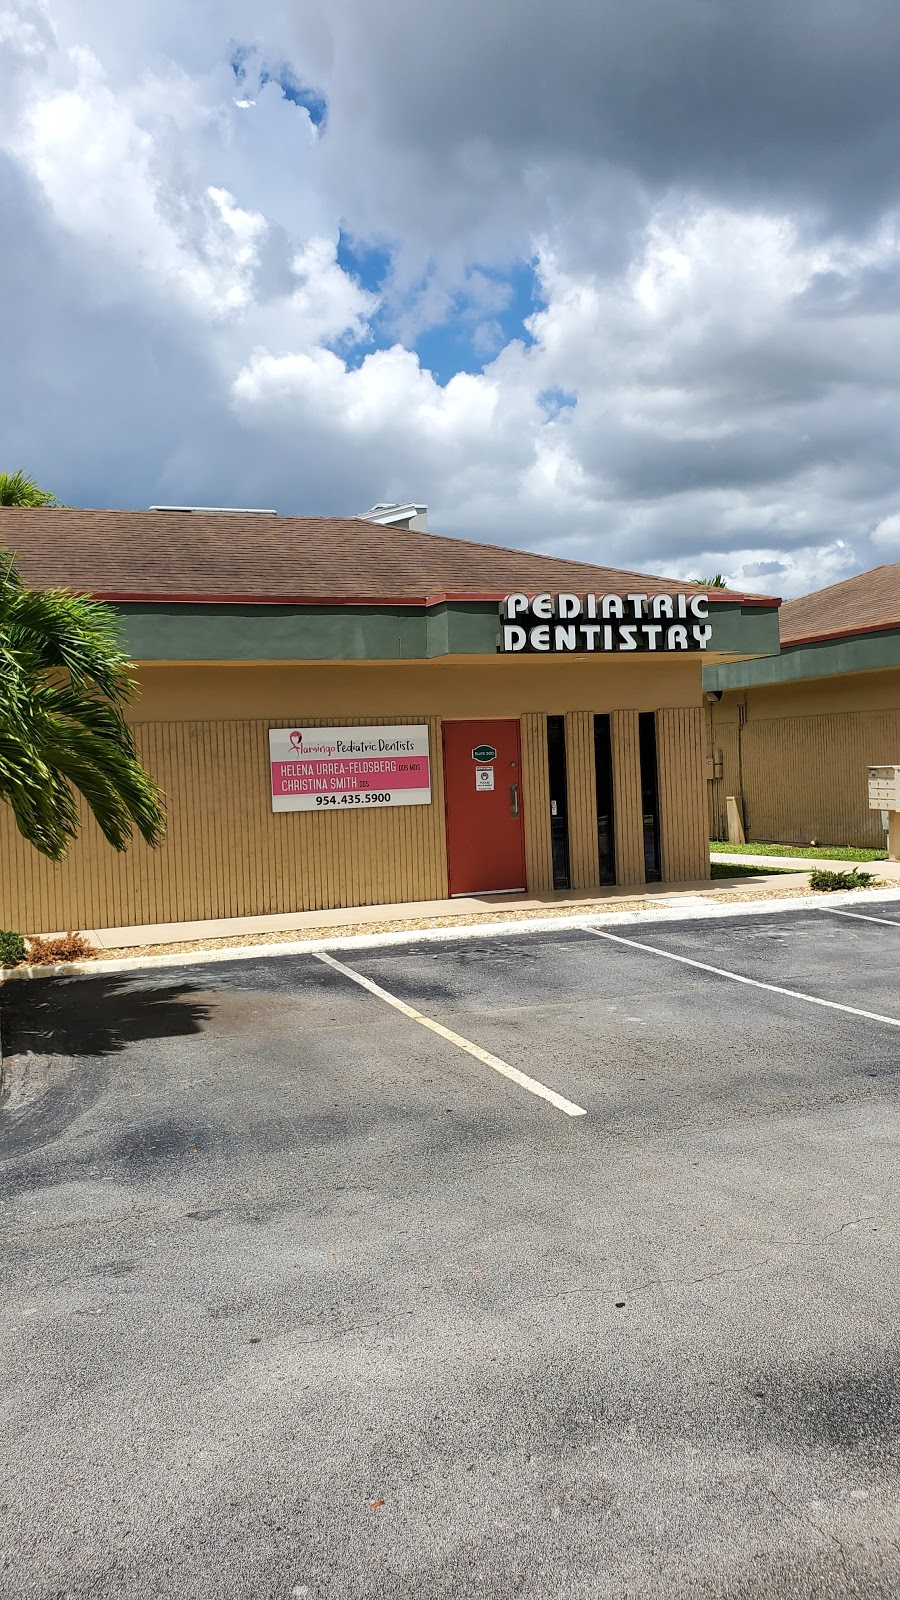 Flamingo Pediatric Dentistry - dentist    Photo 2 of 3   Address: 12301 Taft St, Pembroke Pines, FL 33026, USA   Phone: (954) 435-5900